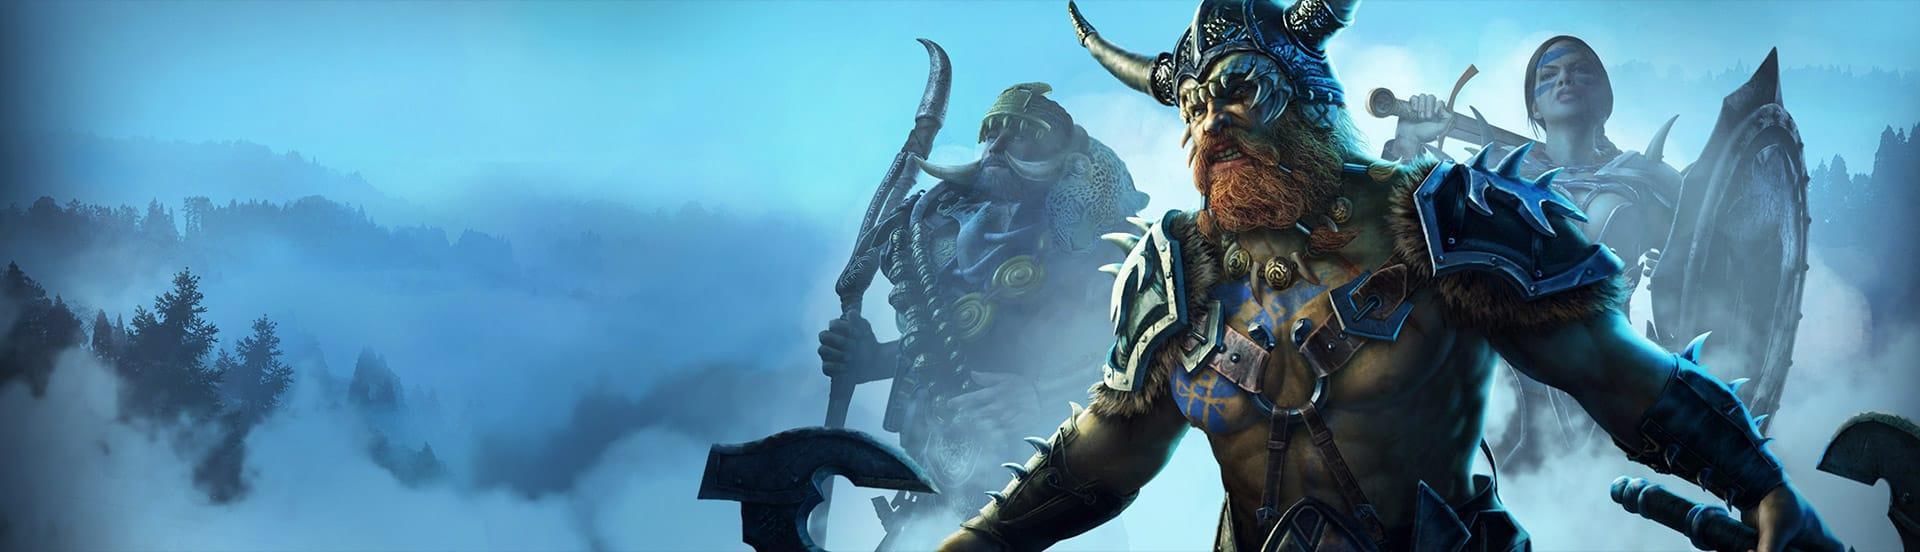 Vikings-war-of-clans-9